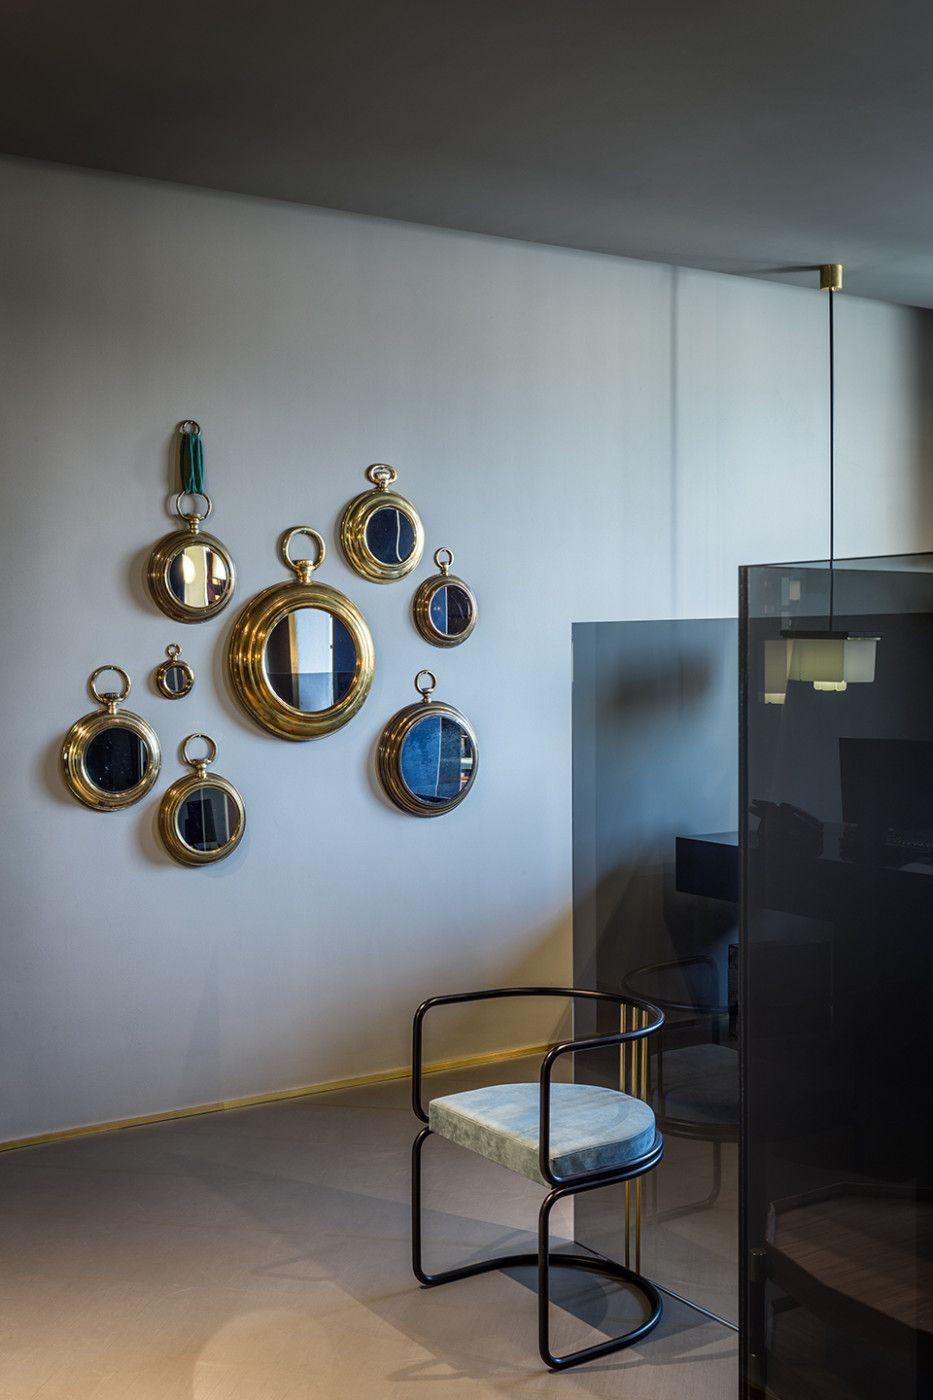 Decorative mirrors for dining room boglioli showroom milan  dimorestudio  dimore studio  pinterest